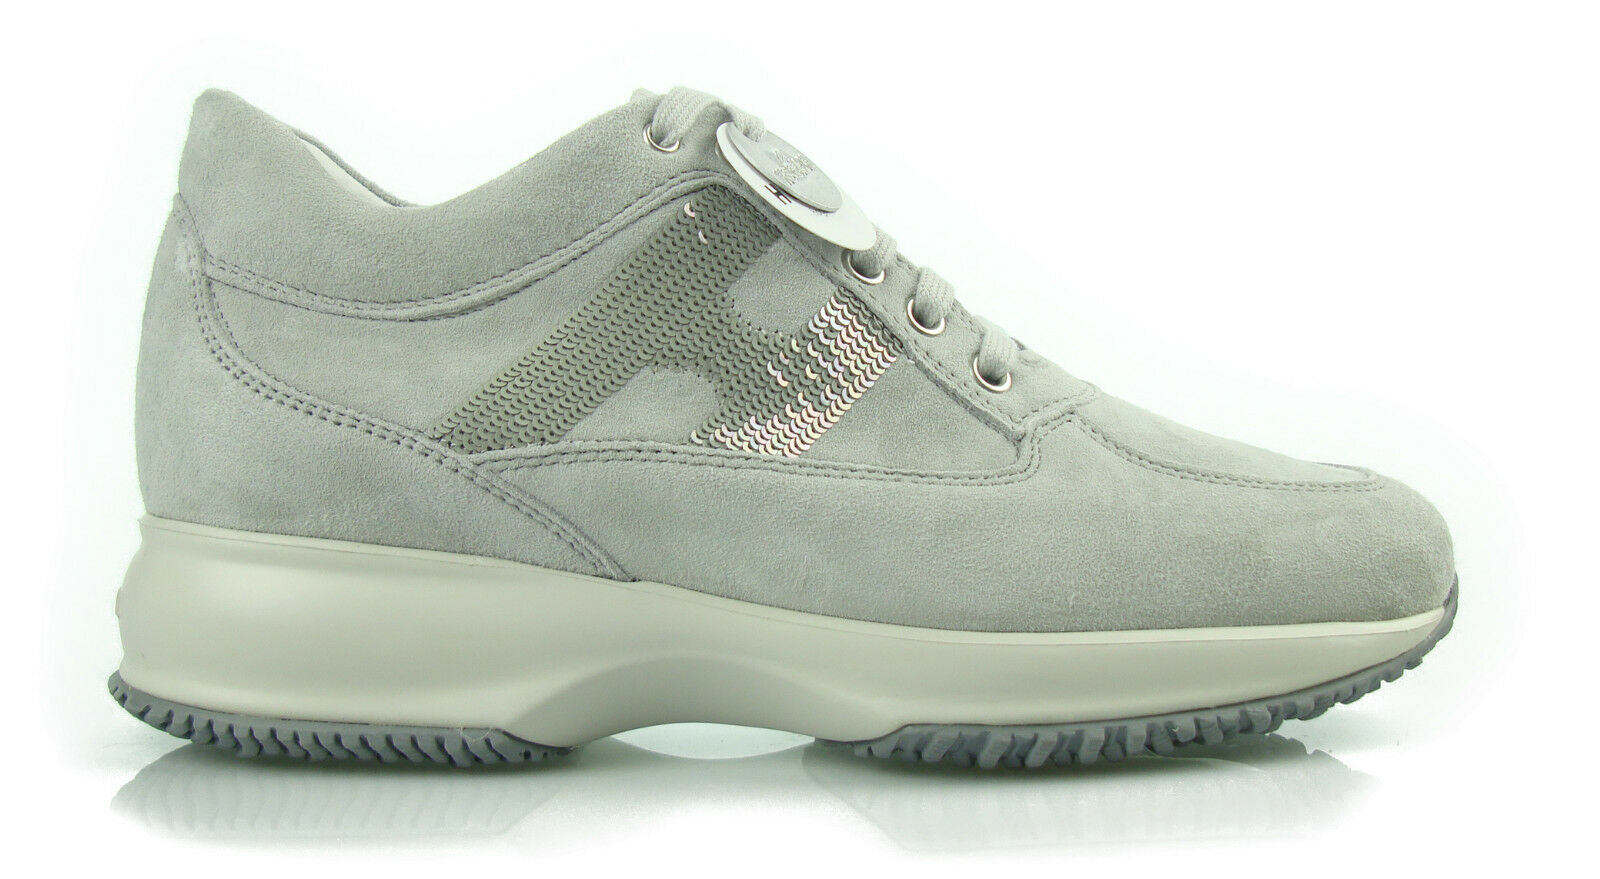 h2 hogan interactive strass grigie scarpe donna shoes damenshuhe women 100% aut 4c489c318b0